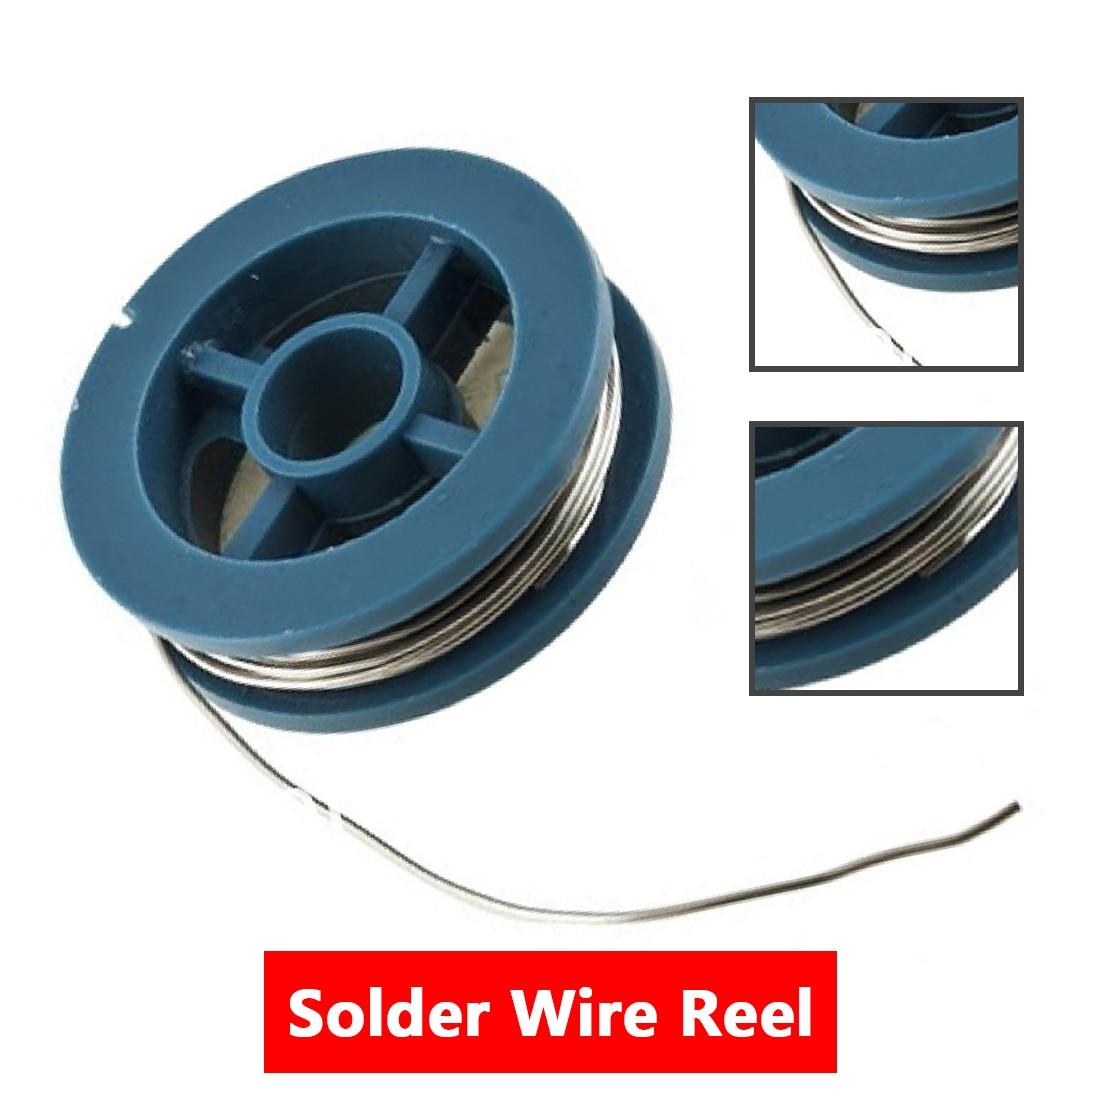 цена на 0.8mm Melt Rosin Core Flux Solder Soldering Welding Wire Tin Lead Welding Wires Tin Welding Lead Welding